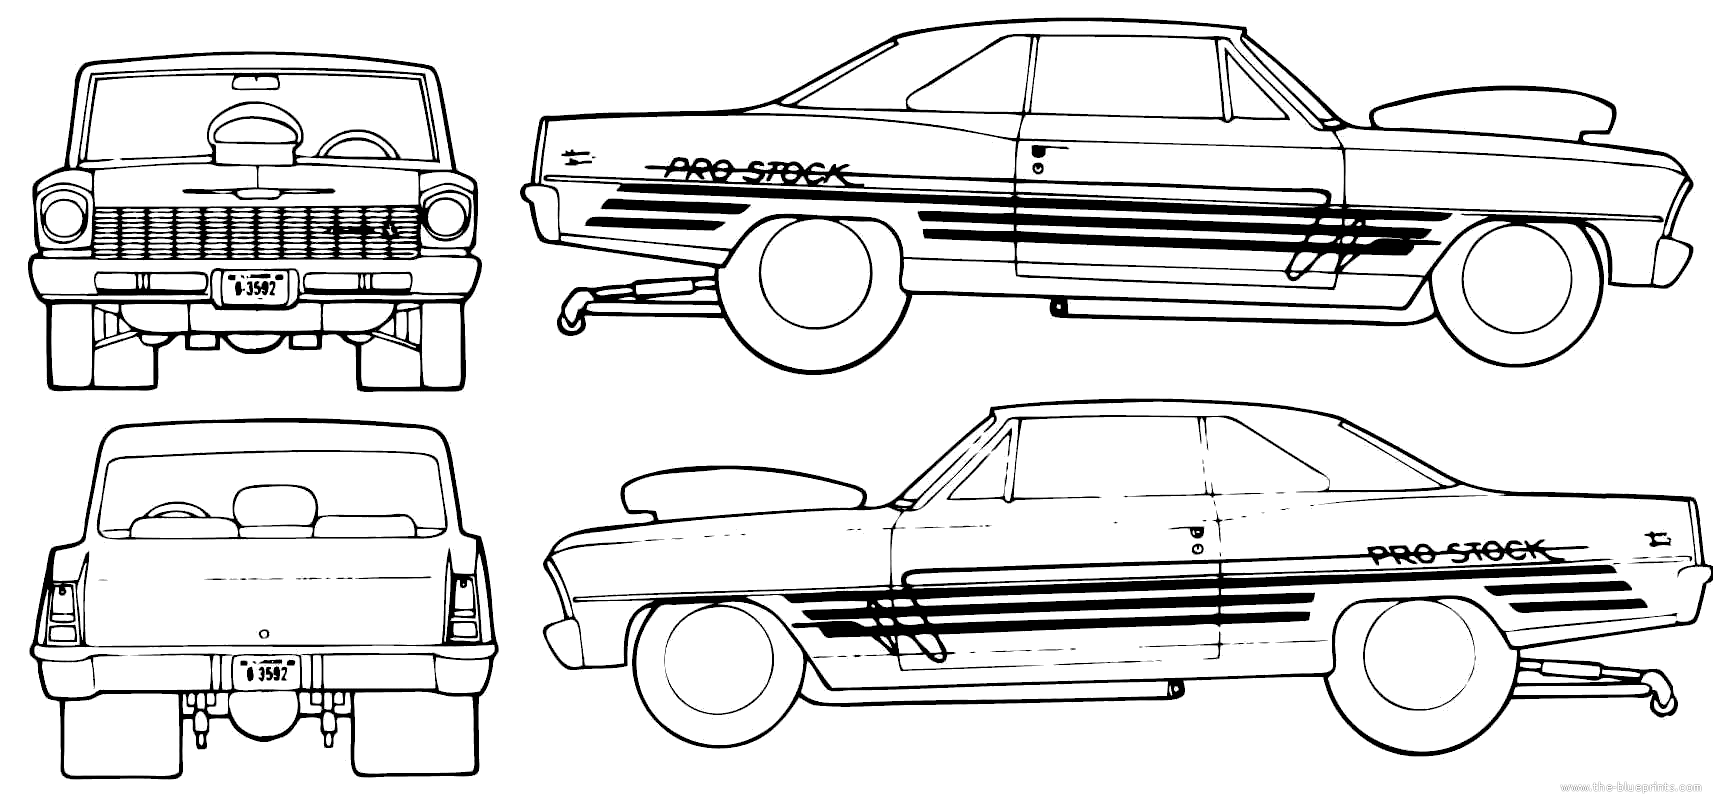 E Blueprints Blueprints Depot Cars